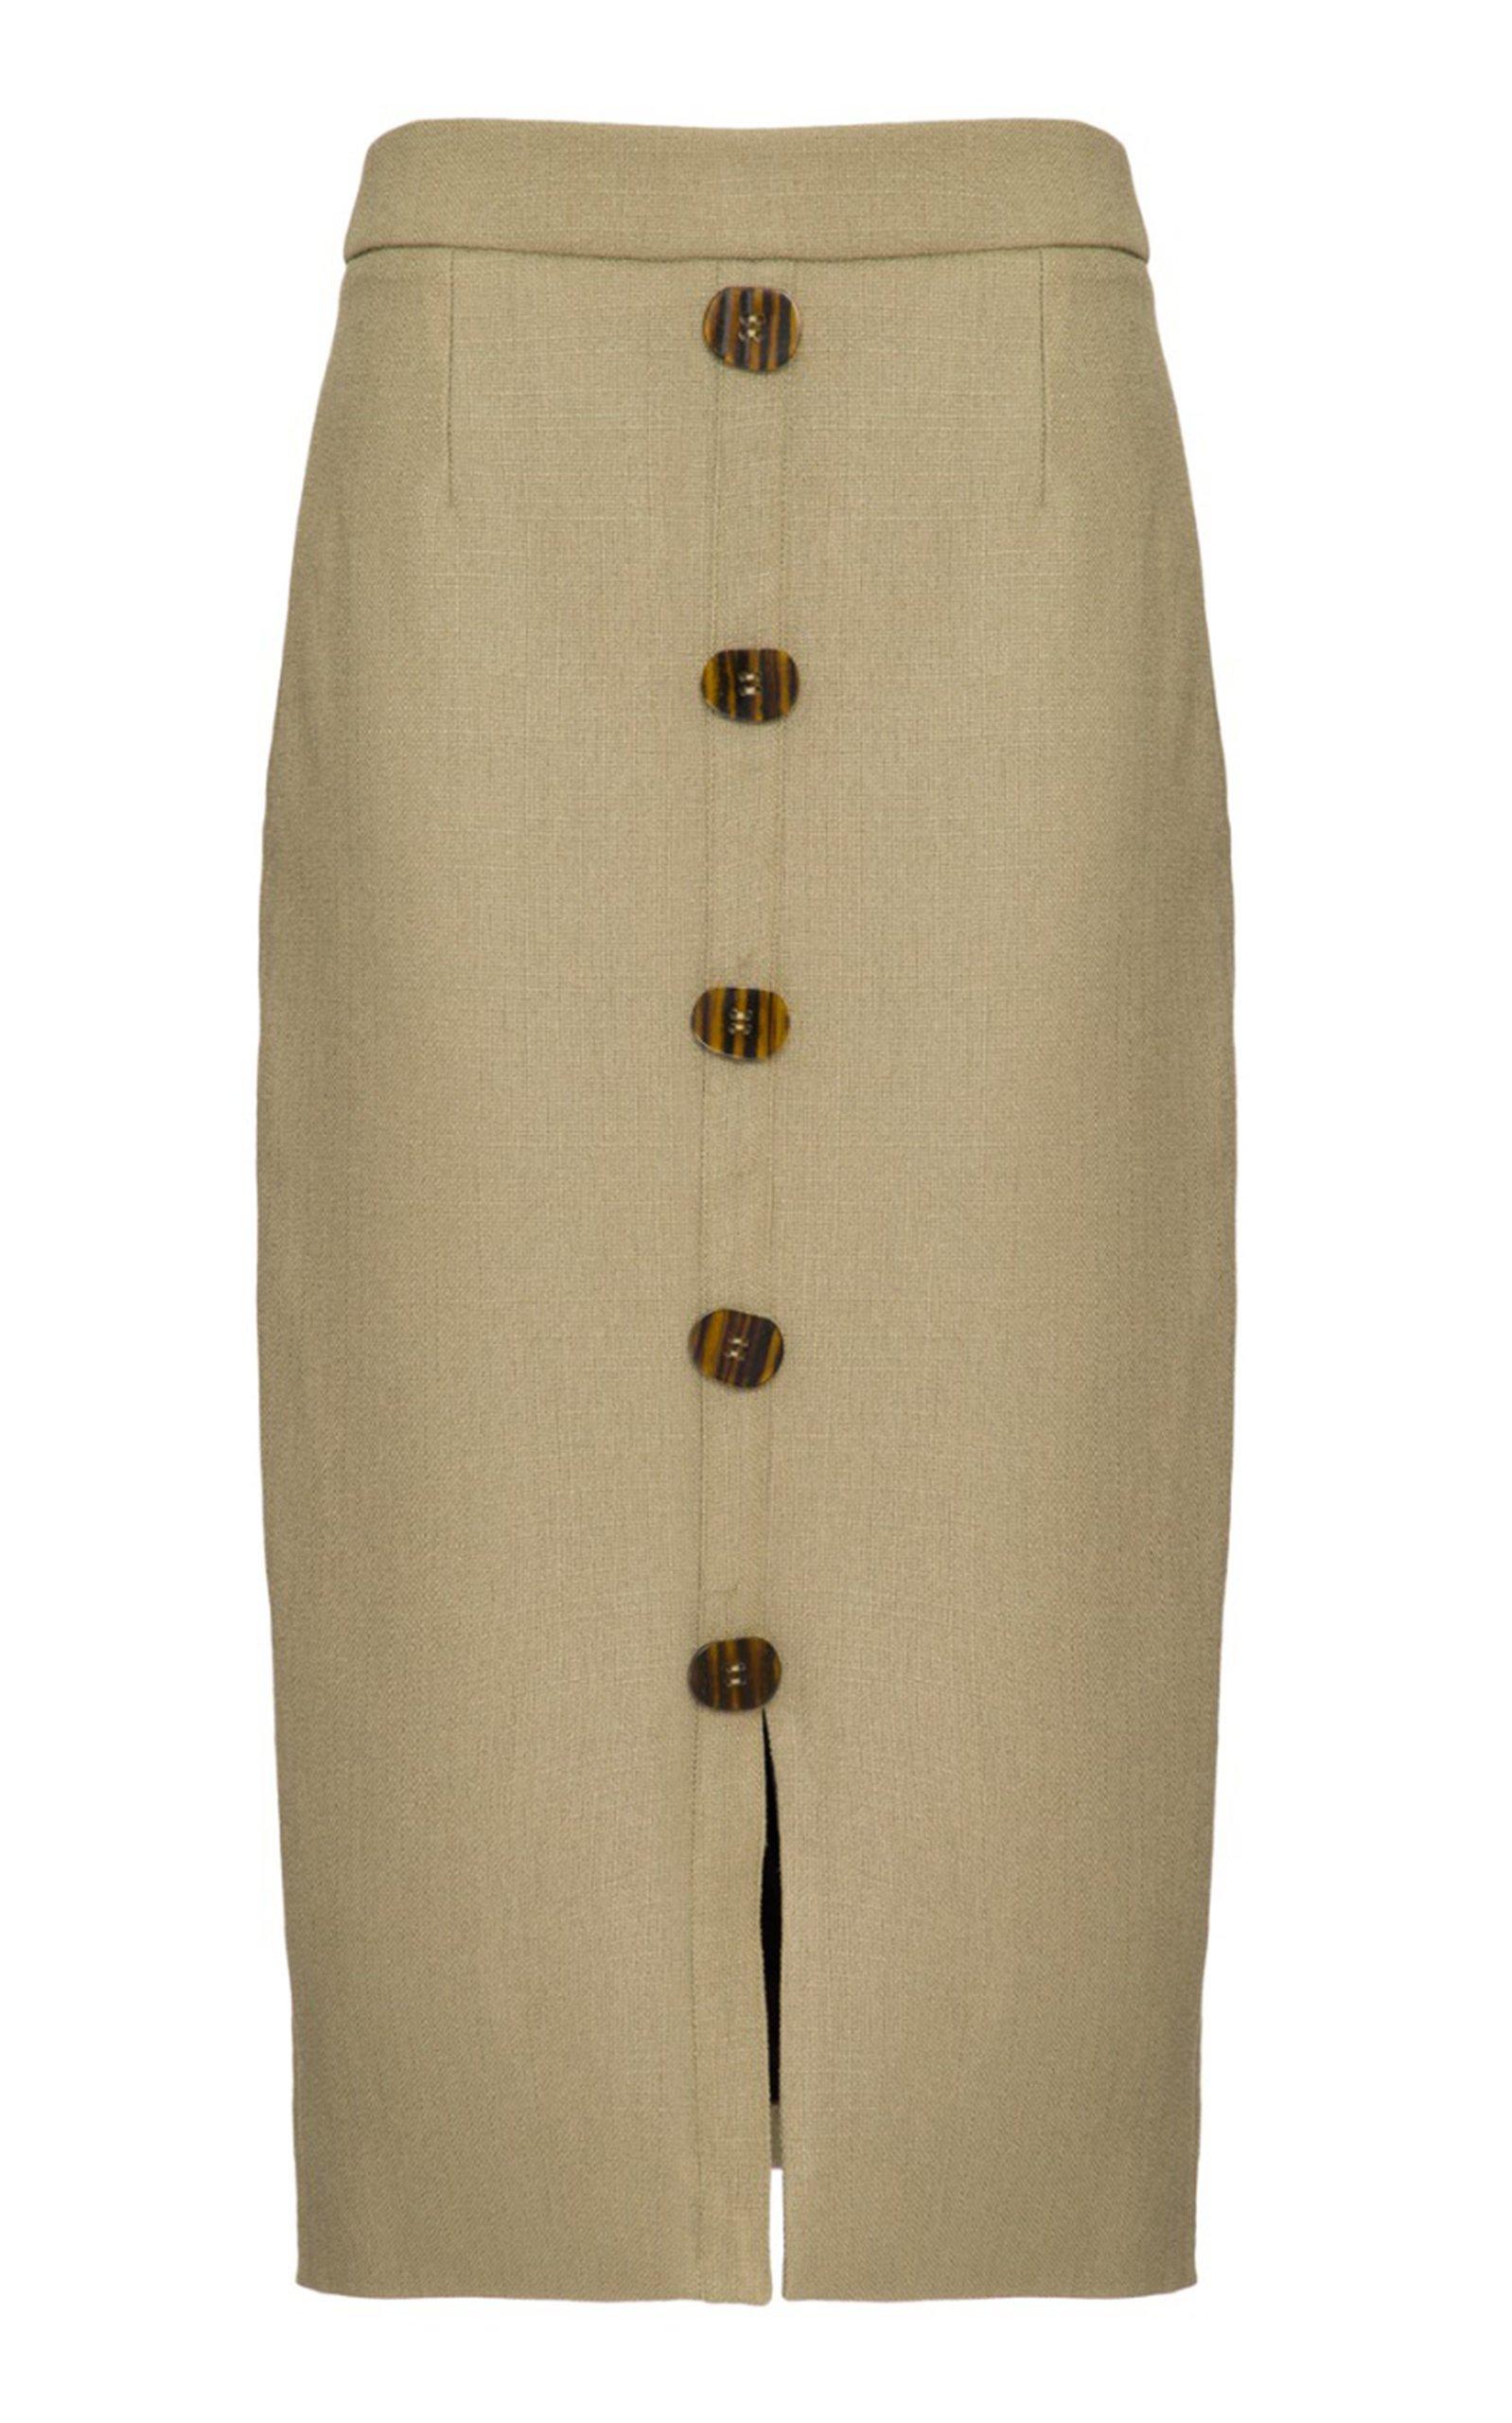 PatBO Linen Pencil Skirt Size: 6